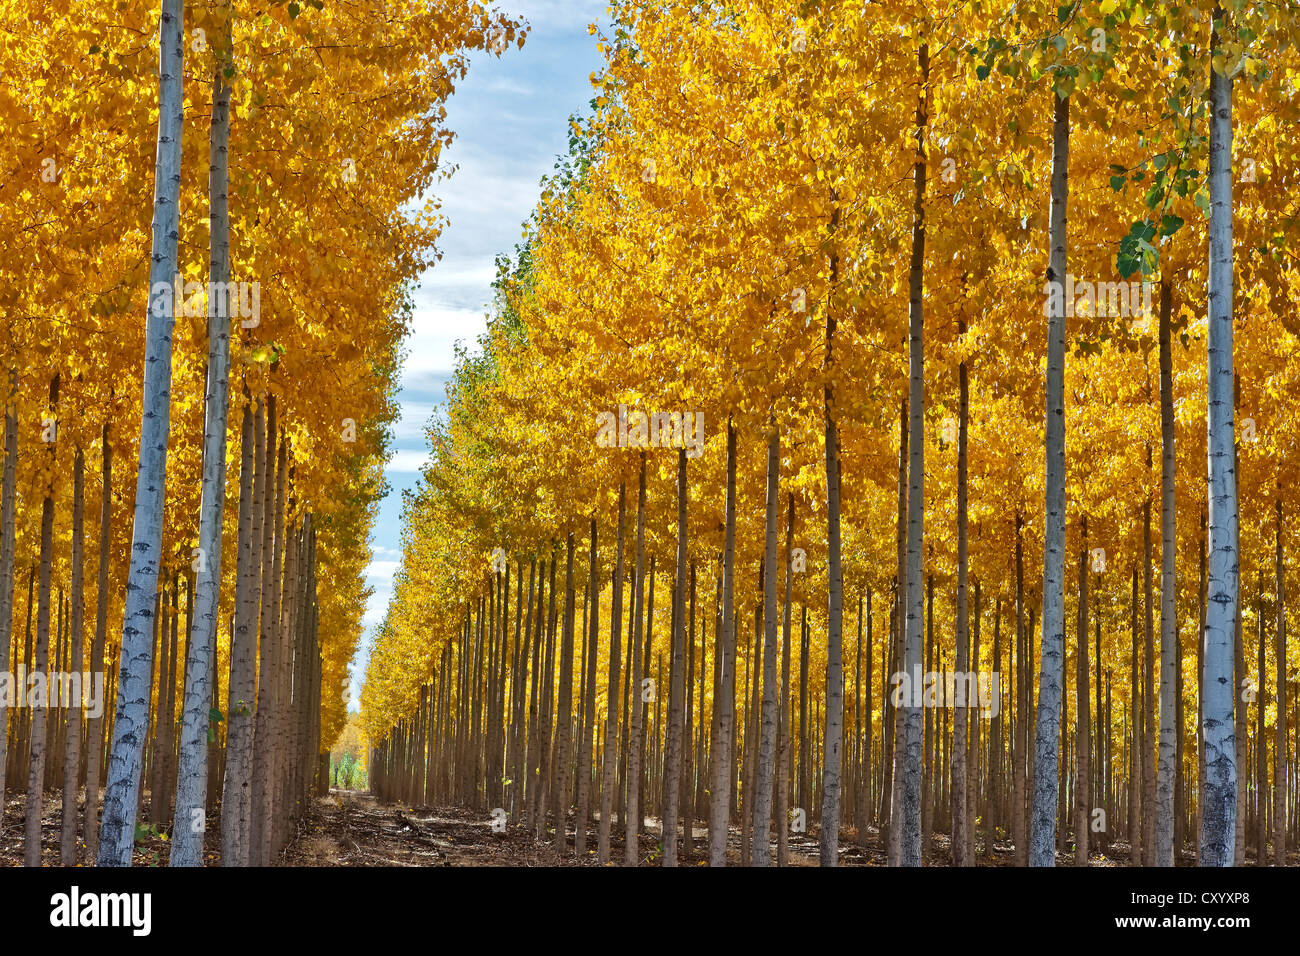 Hybrid Poplar plantation, fall foliage. - Stock Image